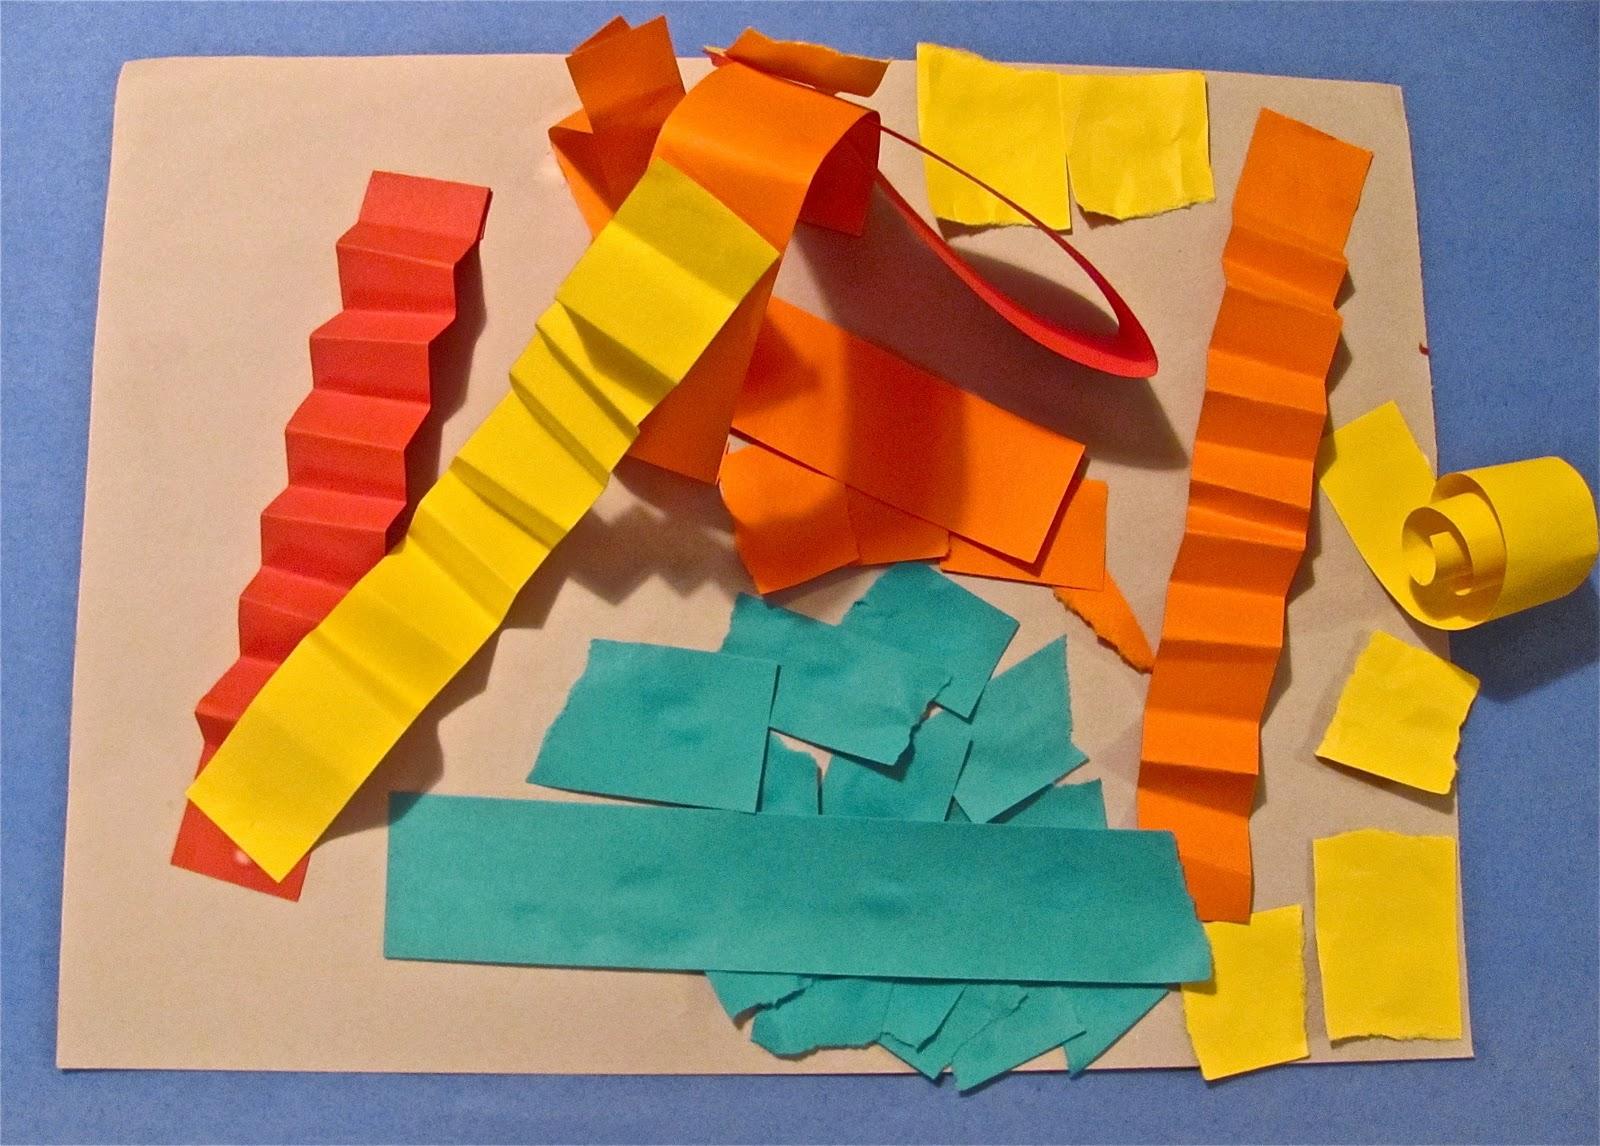 Three Construction Paper Craft Projects: Preschooler-Friendly Activities